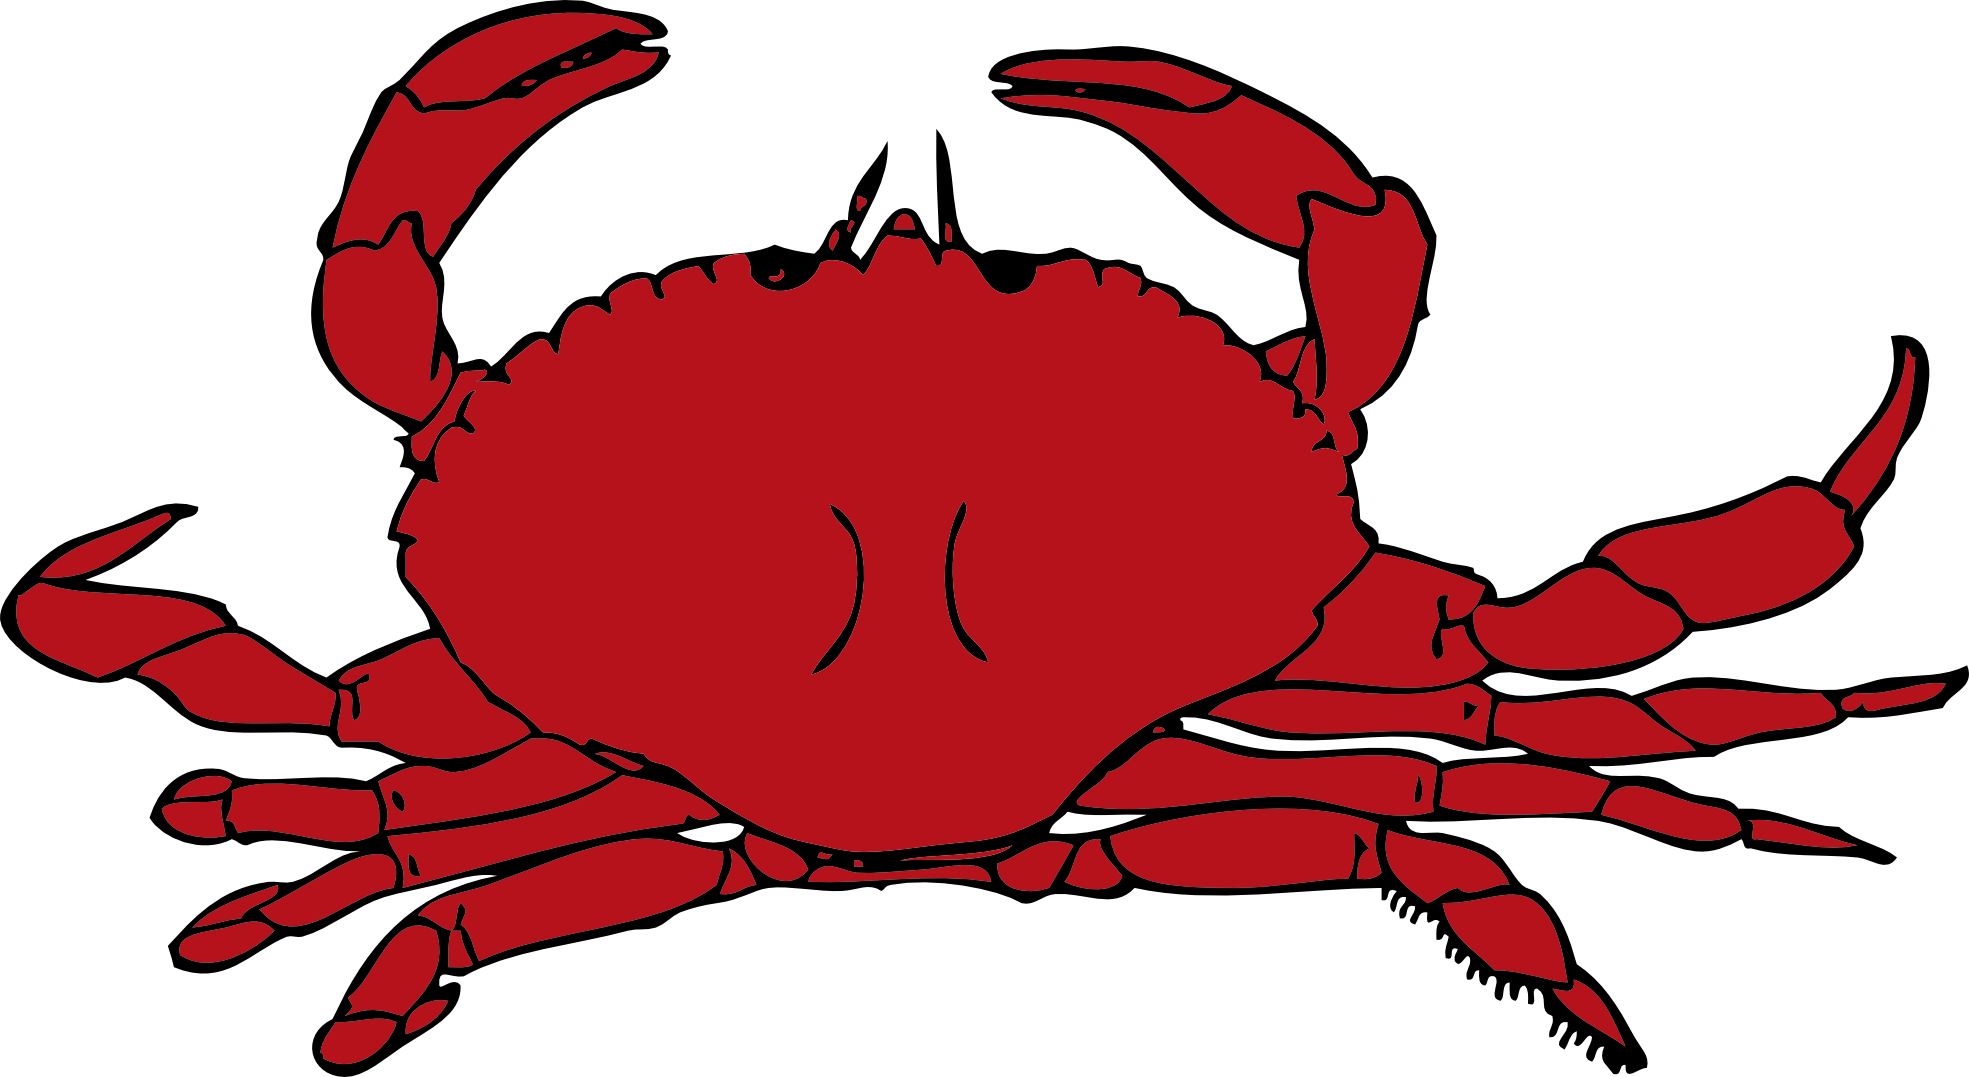 Lobster clipart mud crab. Clip art cartoon panda